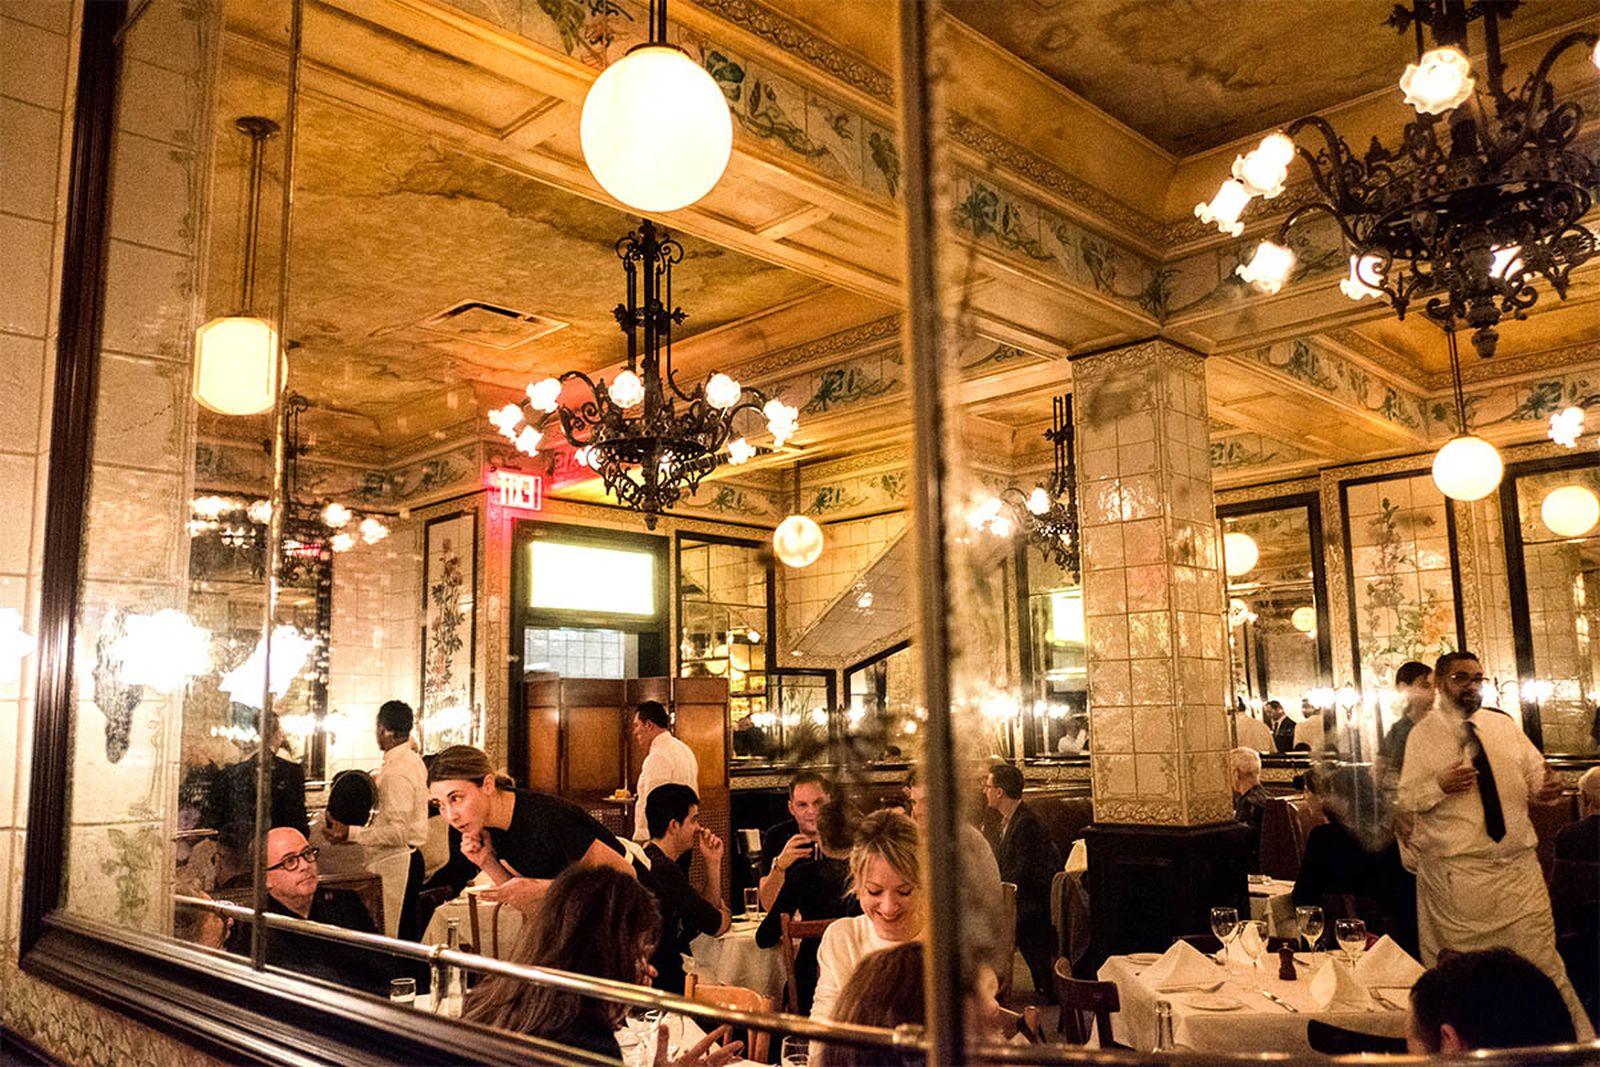 new york mid range restaurants augustine AMEX american express platinum food & drink